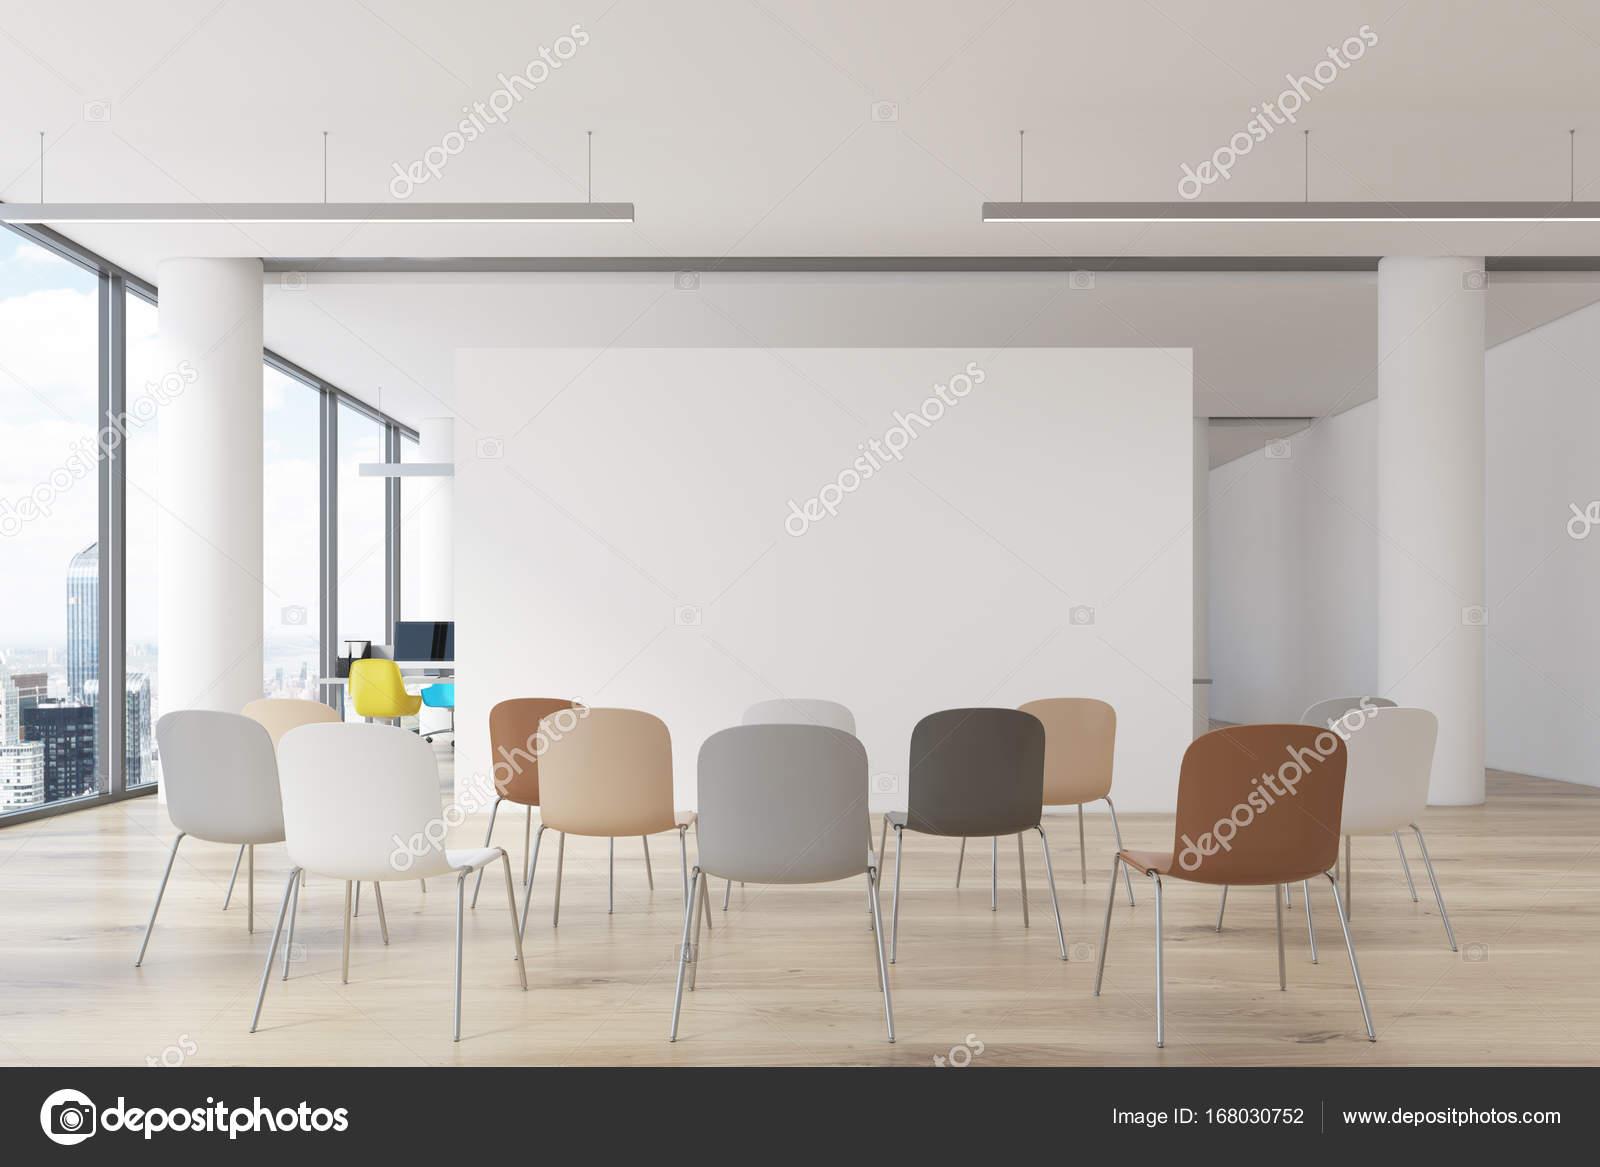 Sedie Ufficio Colorate : Aula ufficio colorate sedie u foto stock denisismagilov